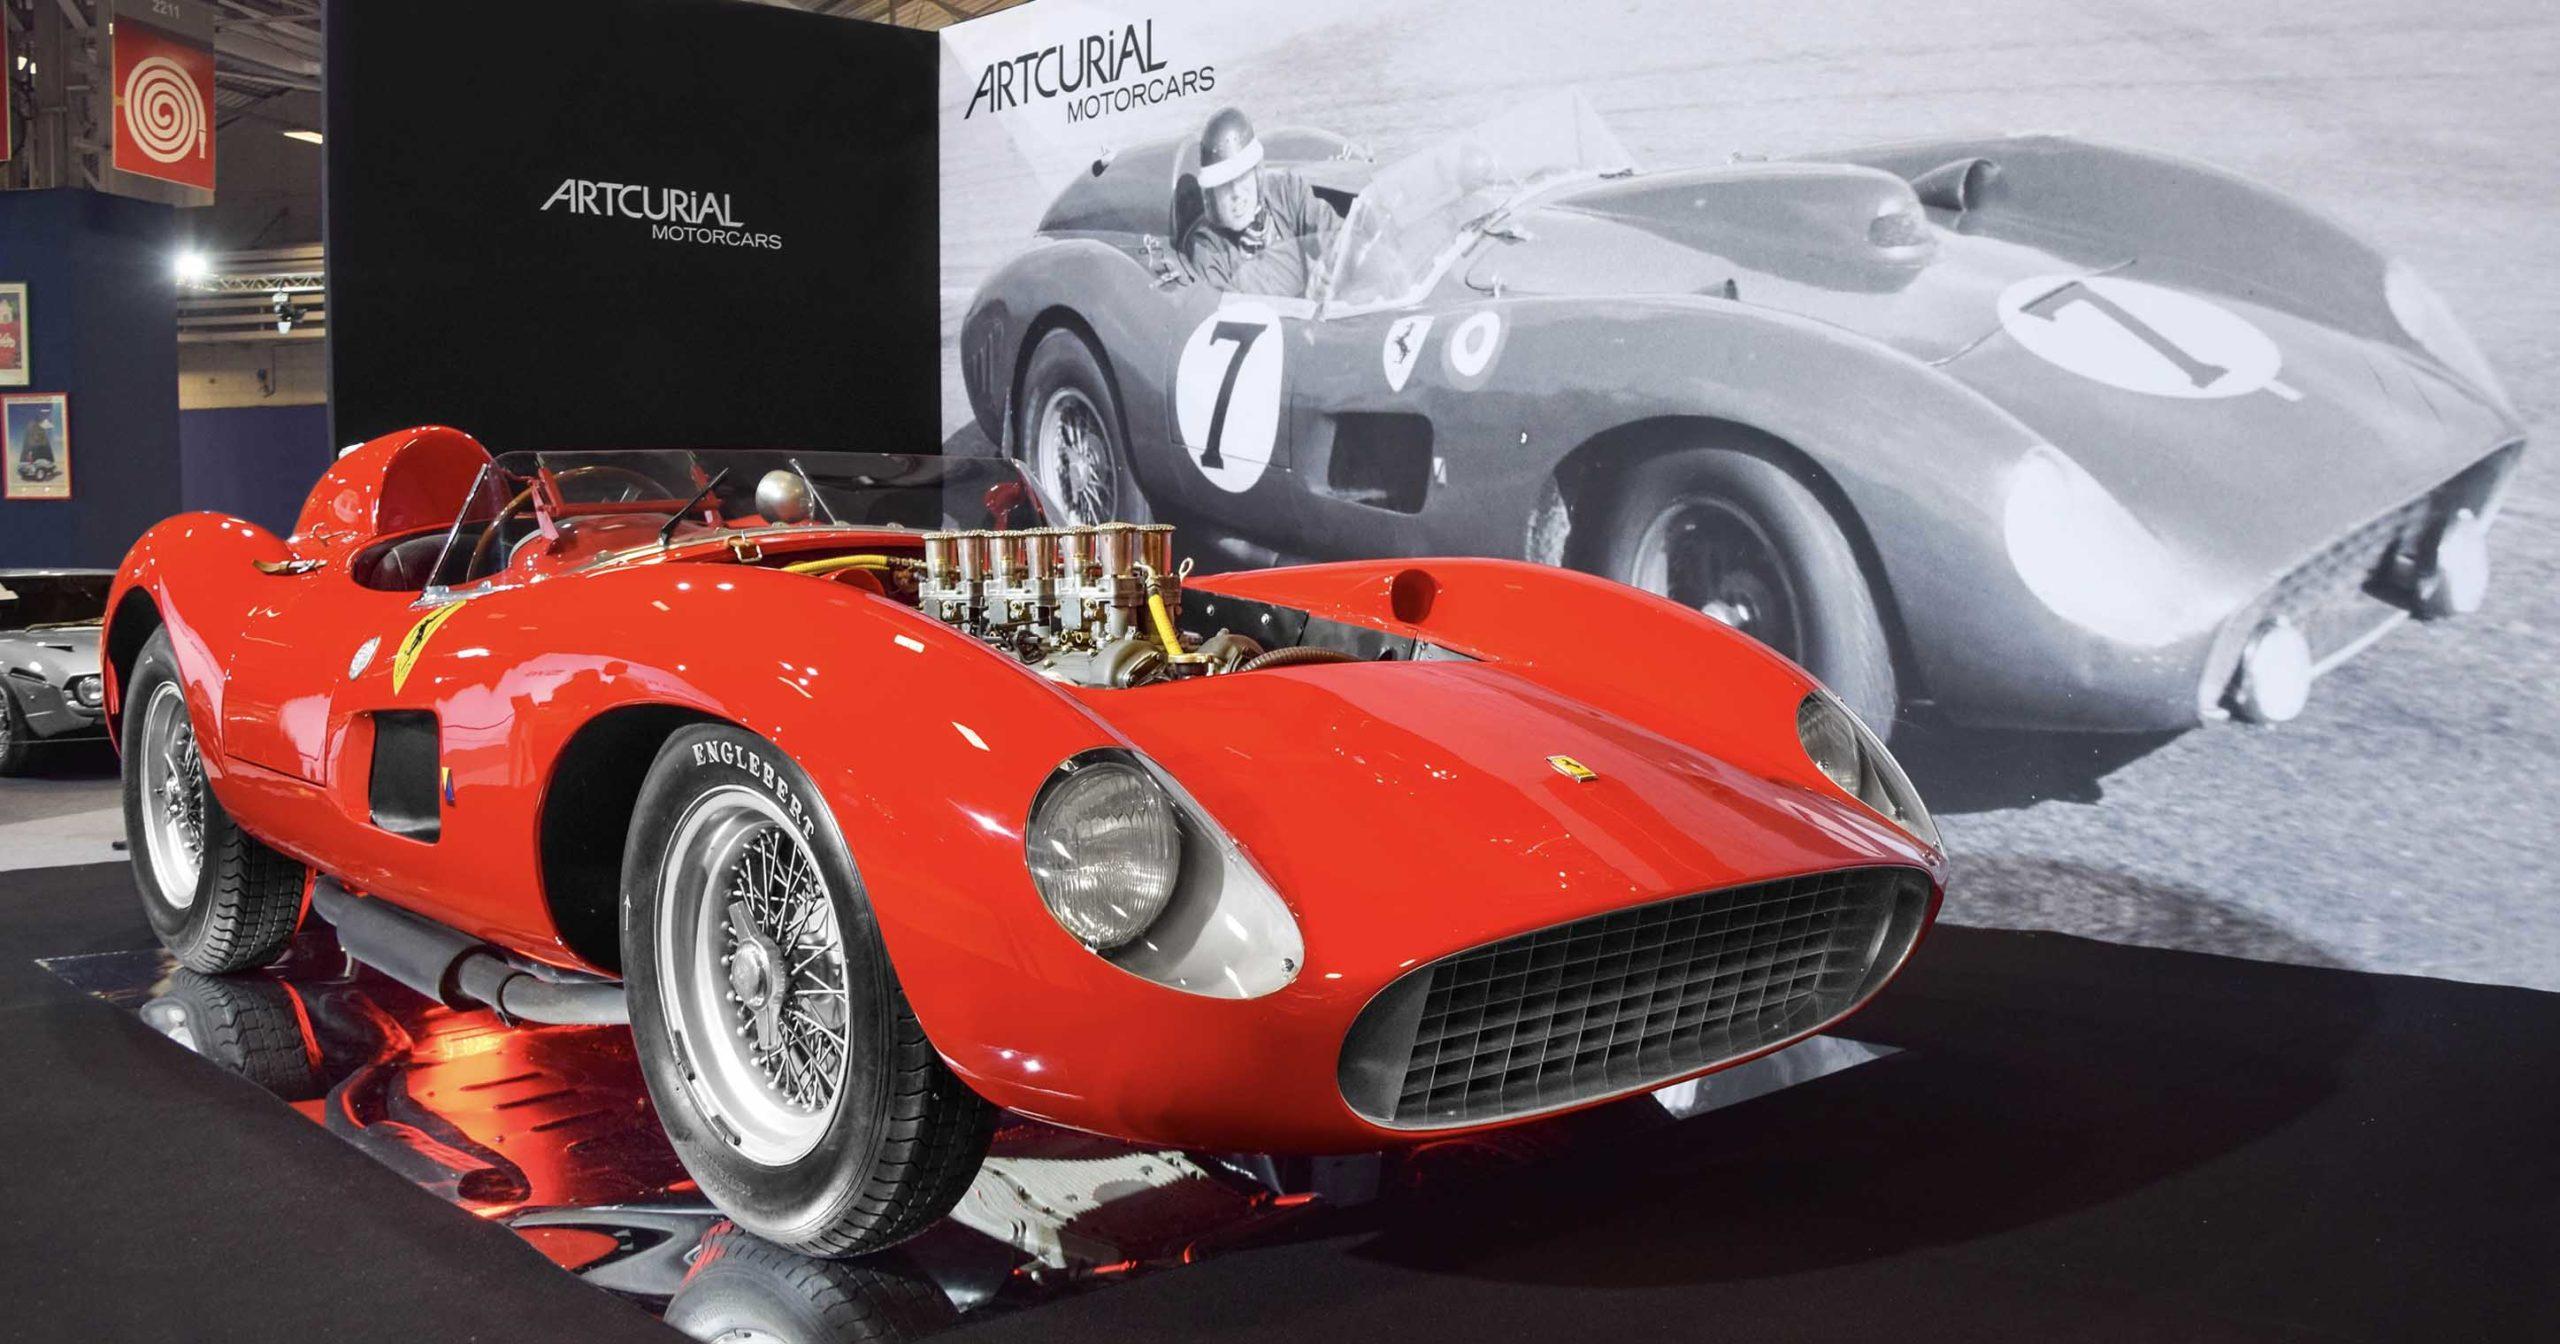 A nice Ferrari showcased.